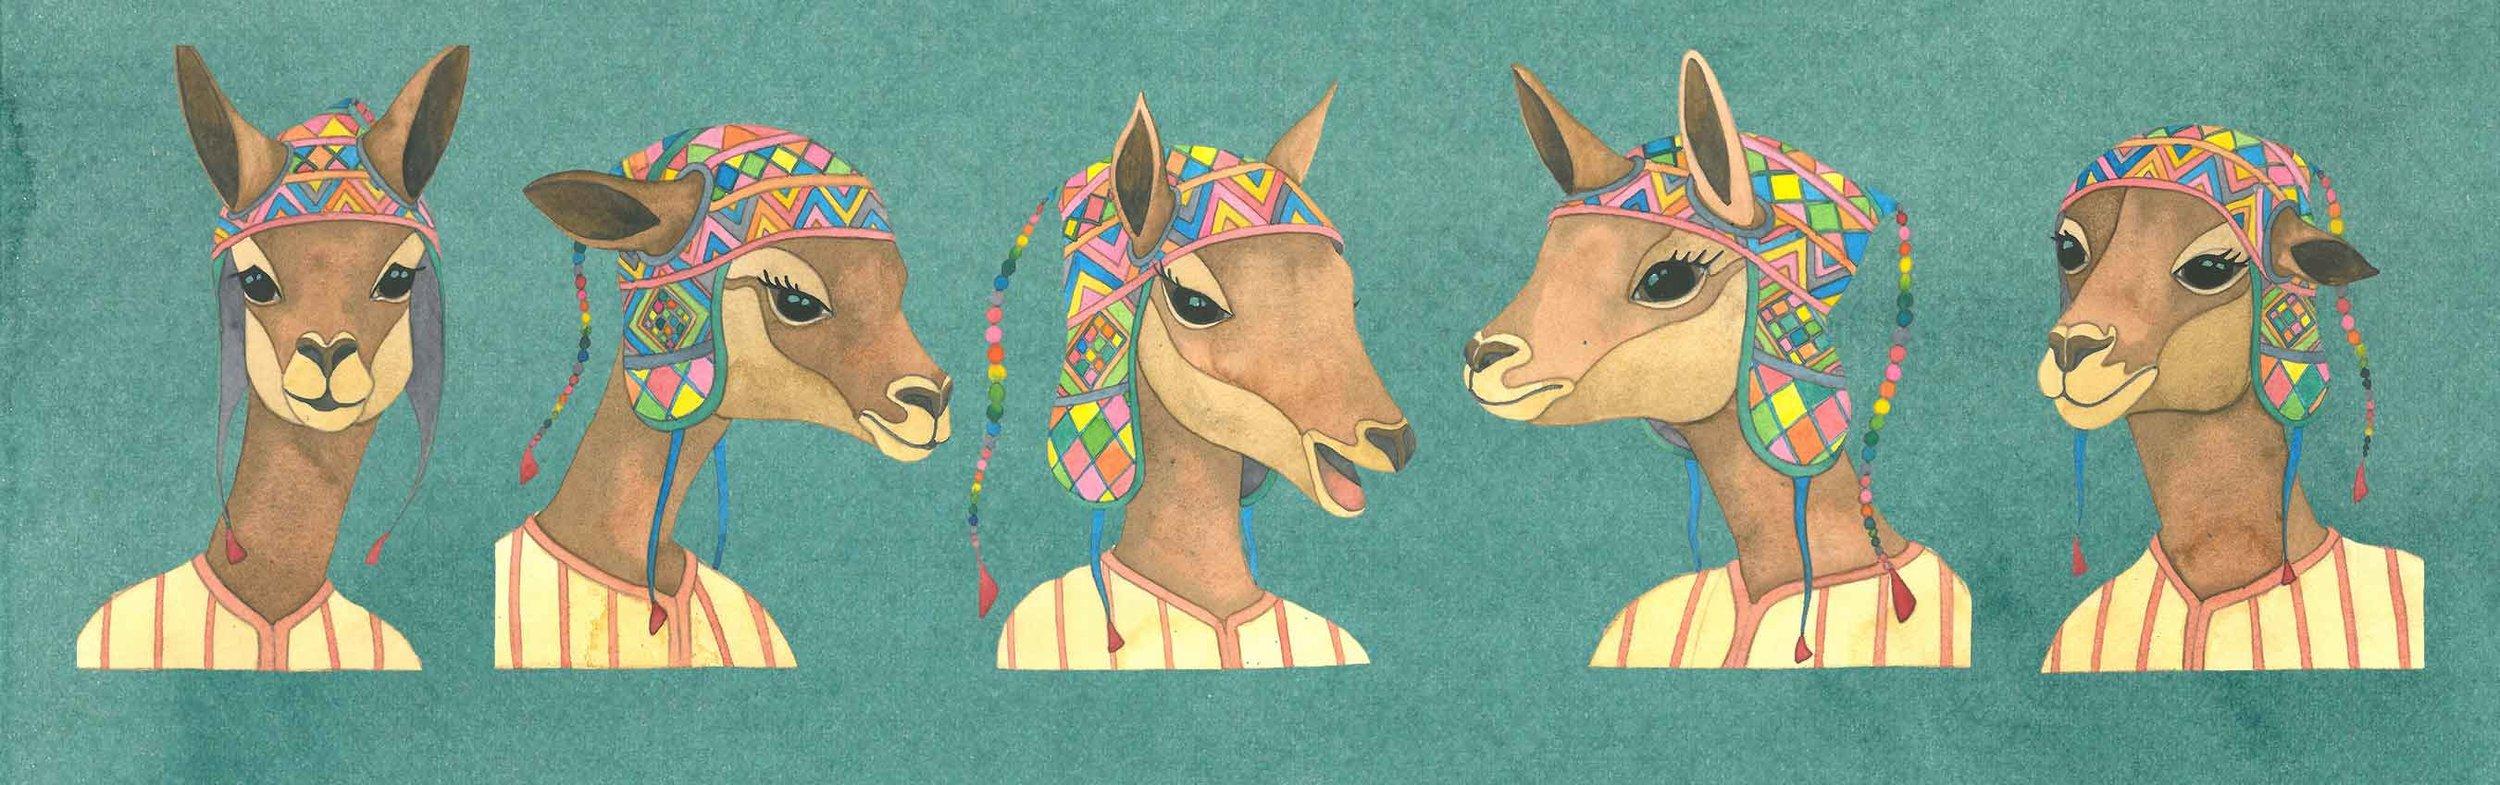 Watercolor Kids Book Character